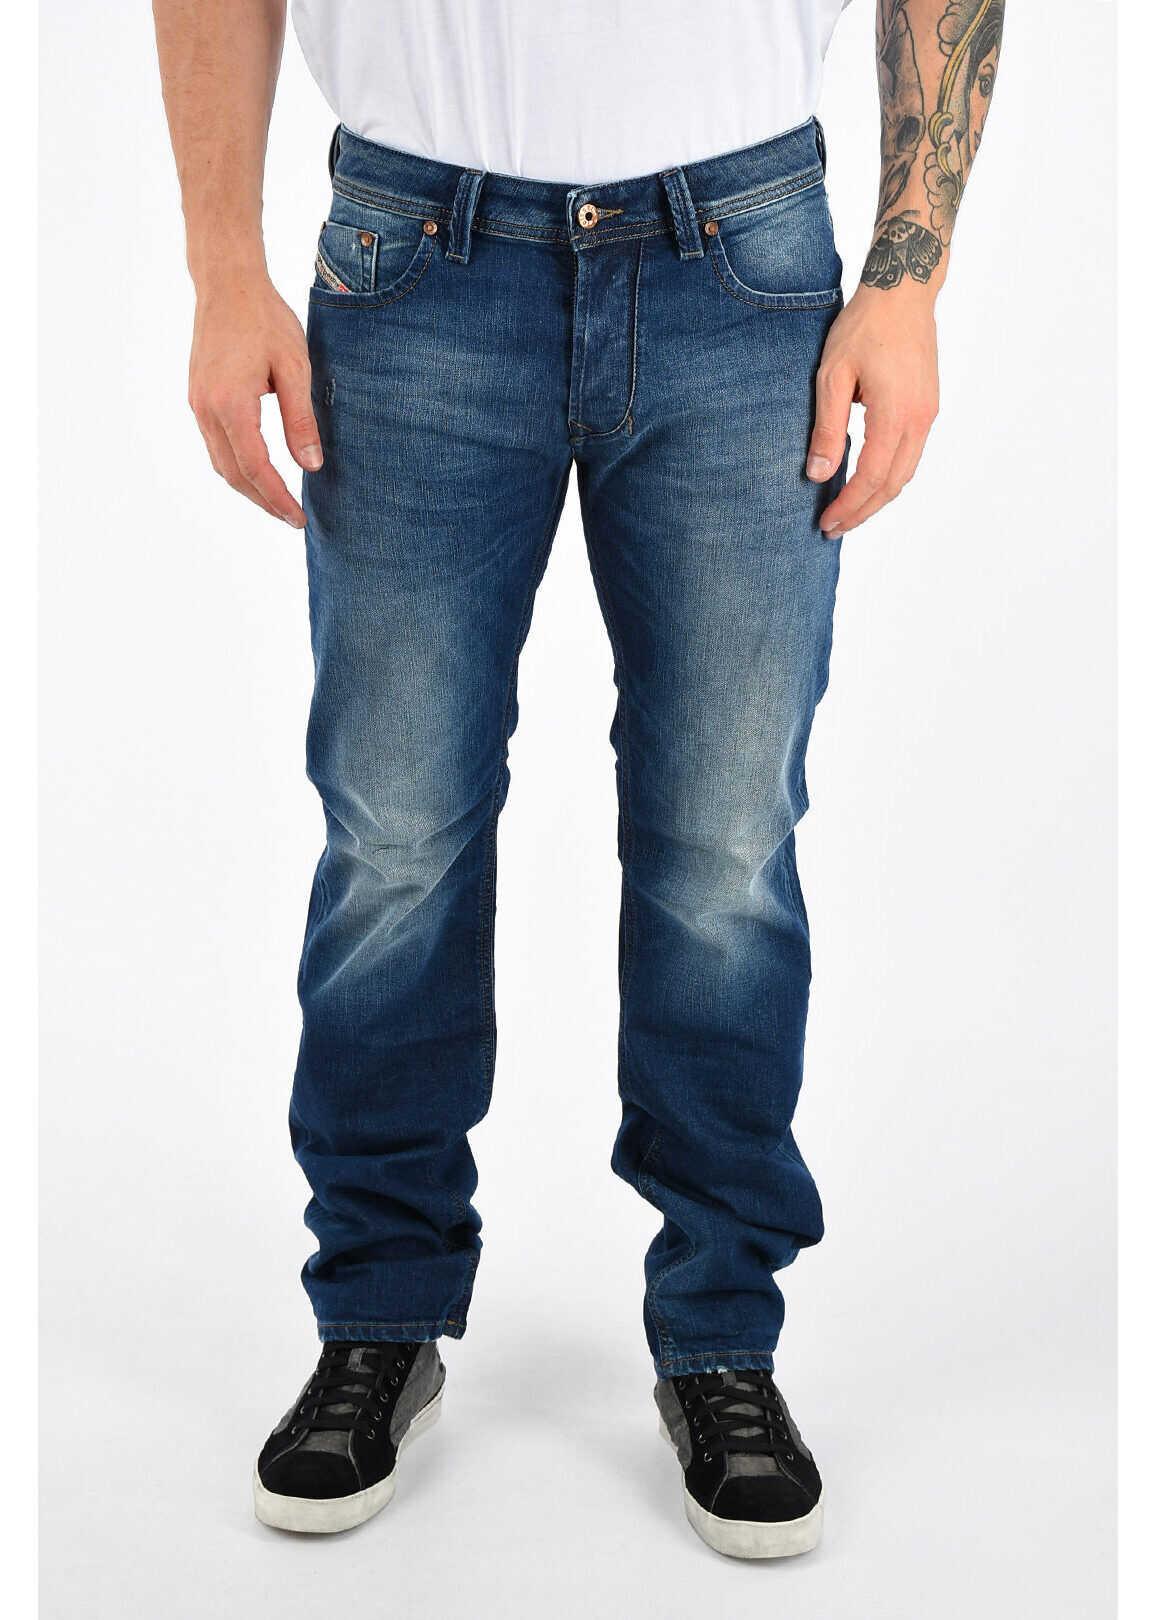 Diesel 21cm Stretch Denim LARKEE Jeans L.32 BLUE